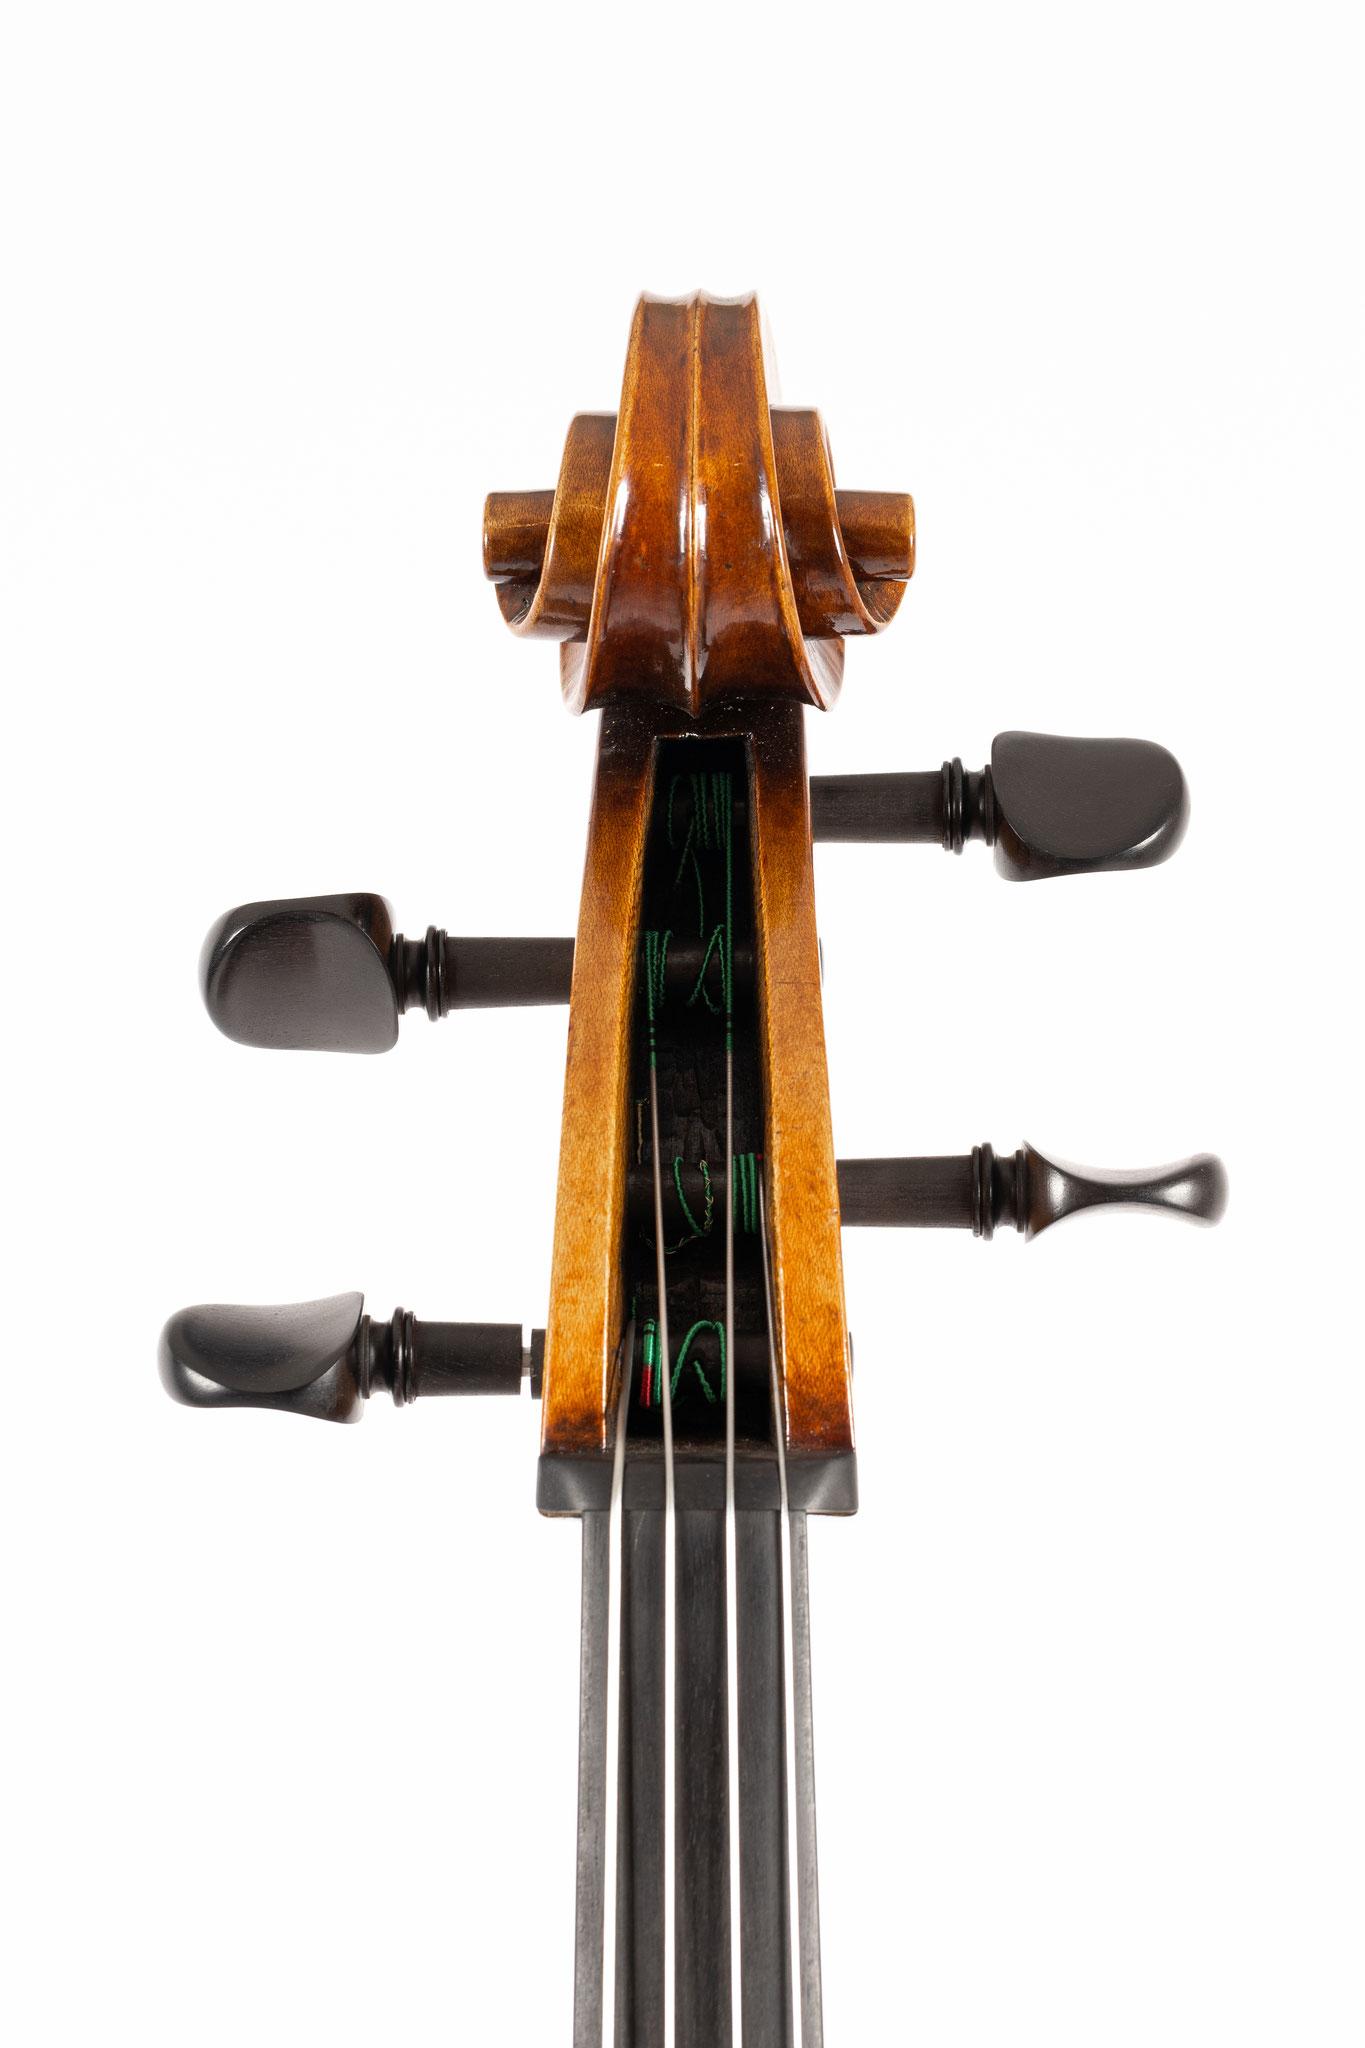 7/8 Cello nach G.B. Guadagnini (2020/CH), Photo: VDB Photography